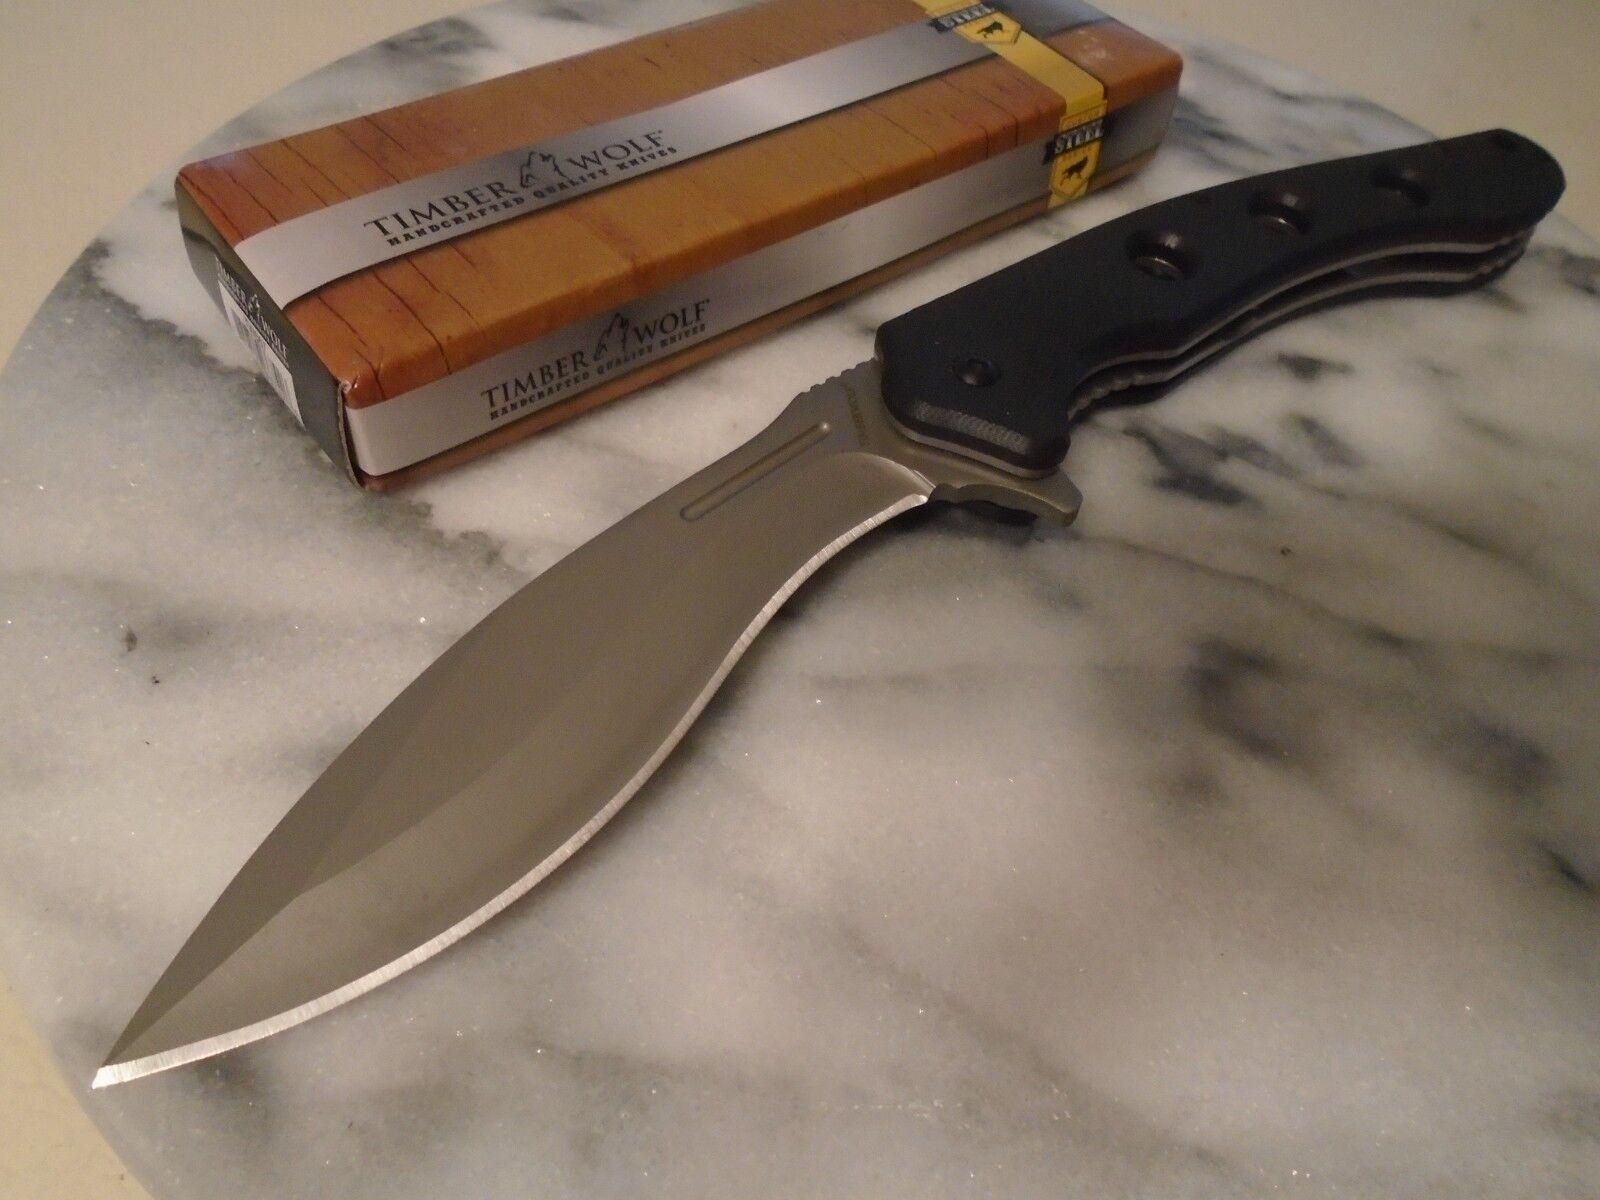 Timber Wolf Assisted Open Kukri Folder Huge Pocket Knife G10 TW667 11″ Open New